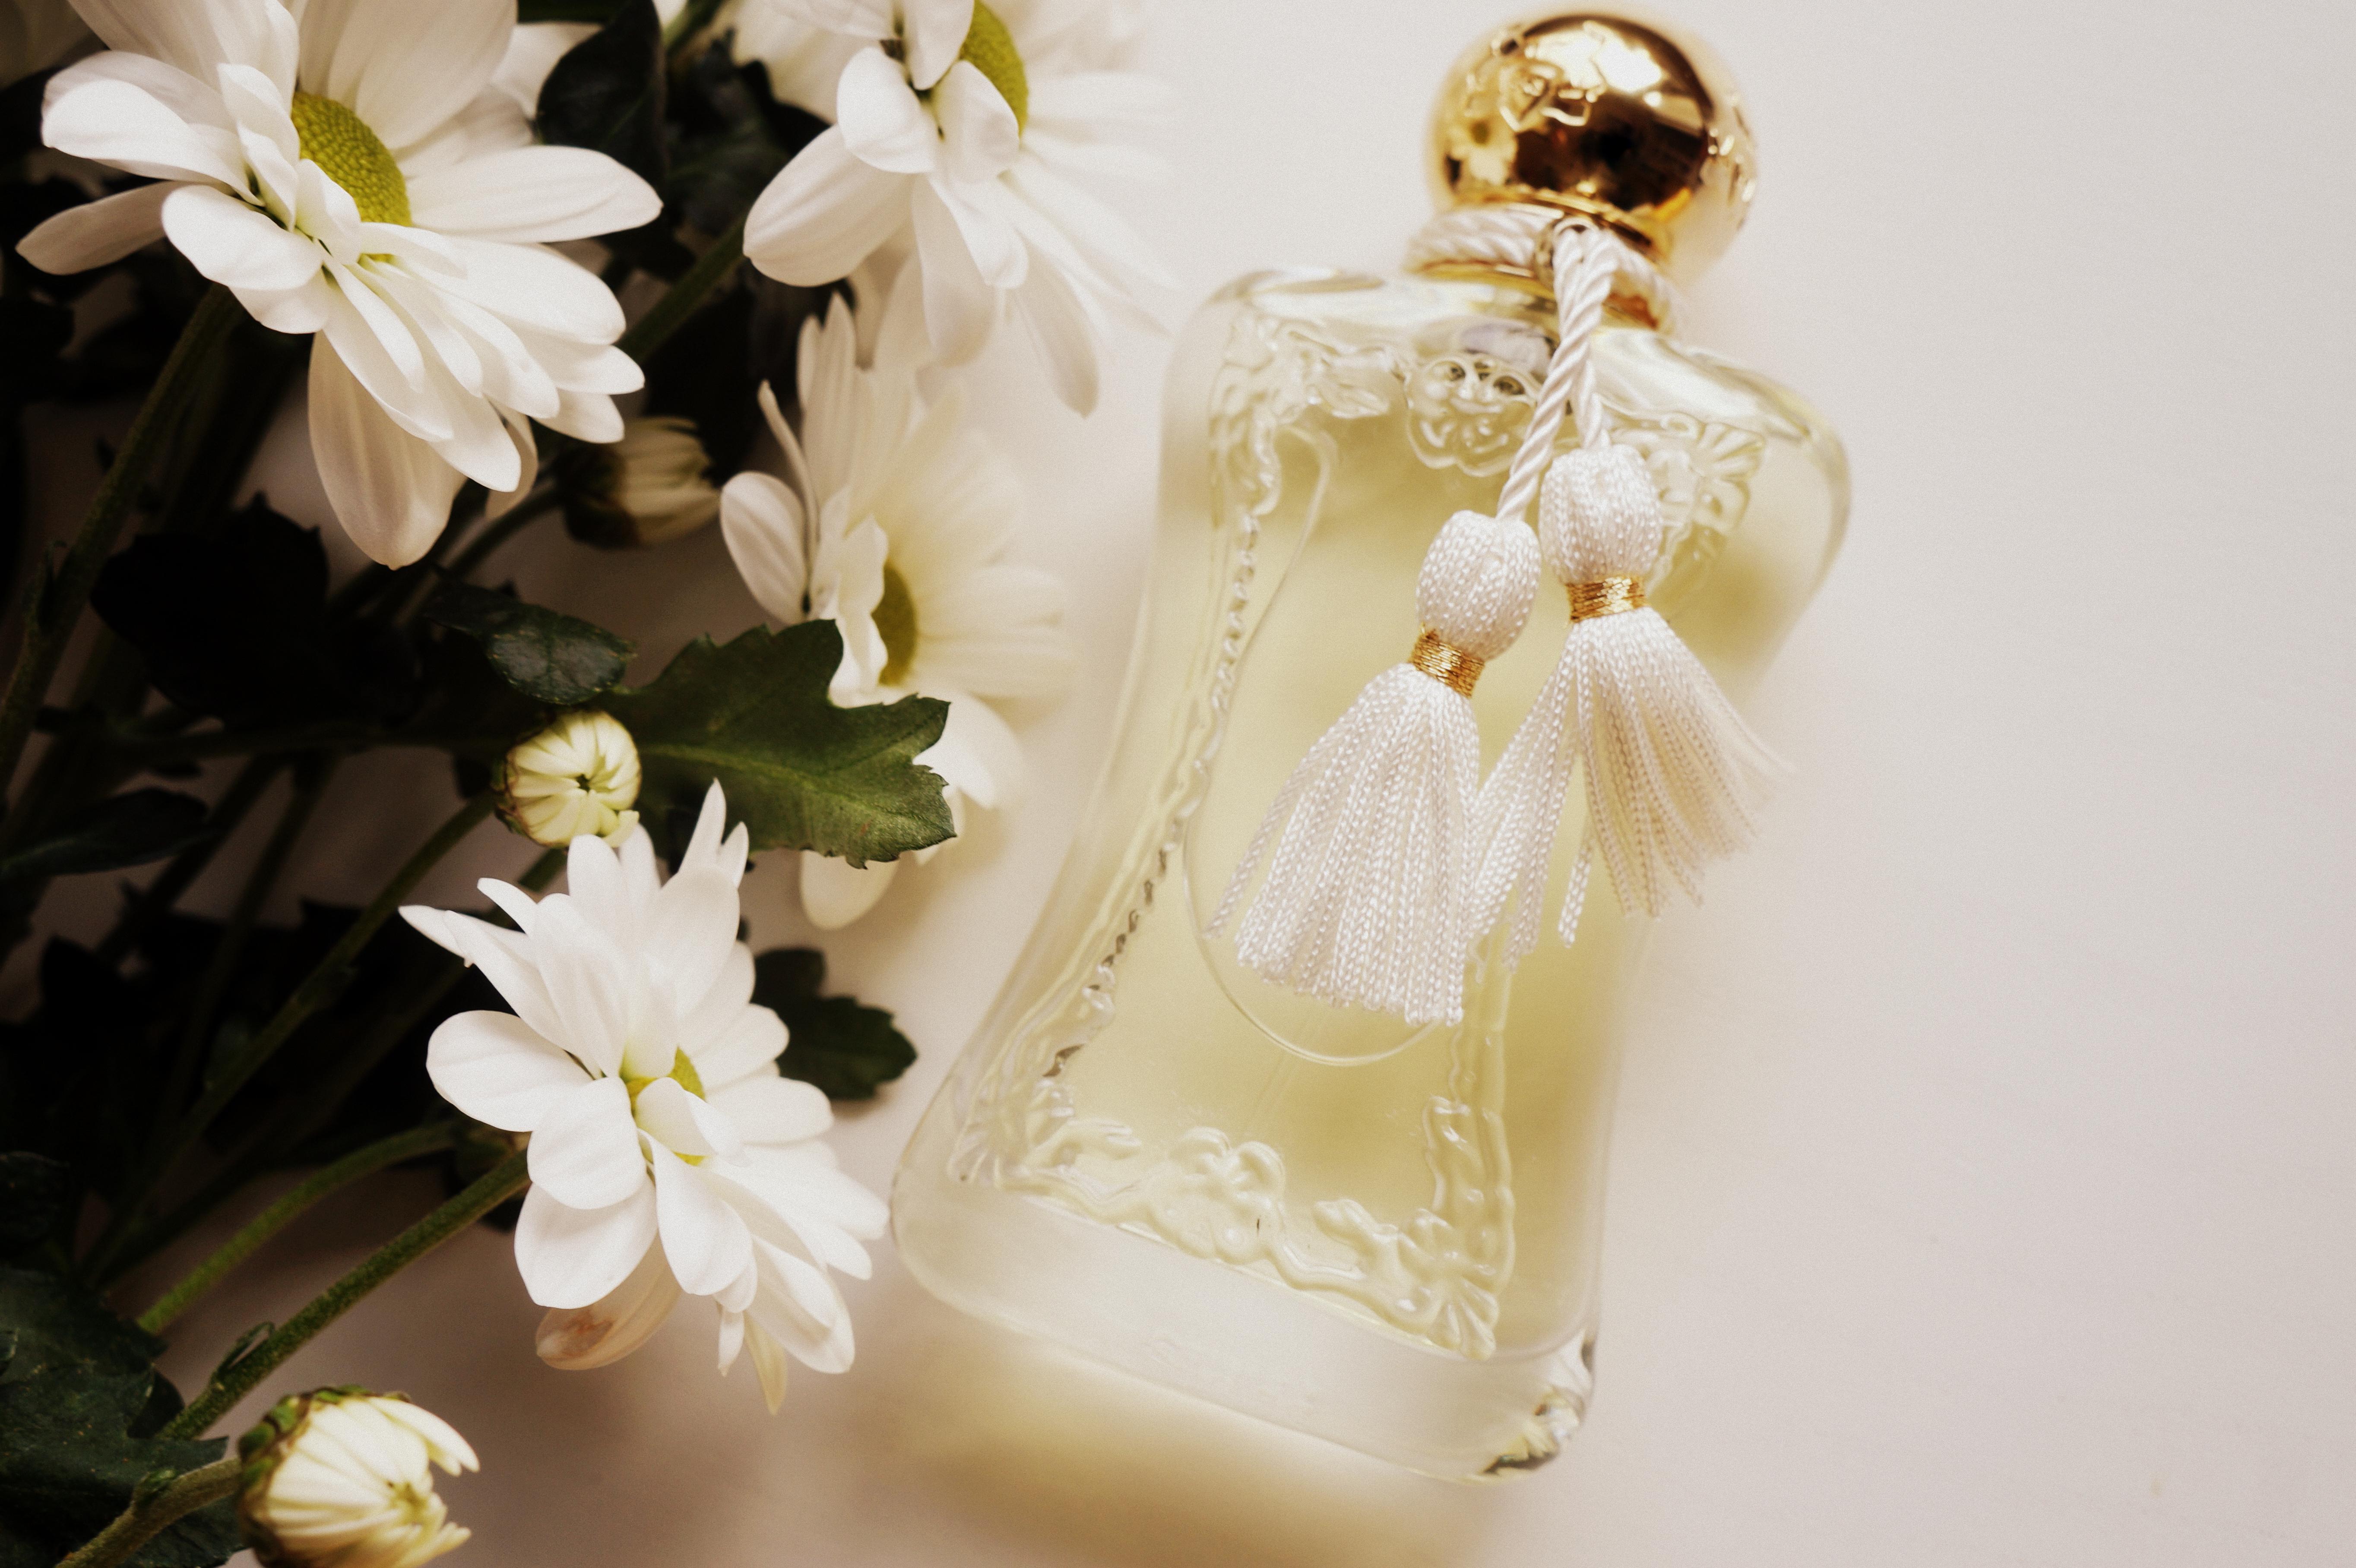 meliora parfums de marly edpholiczka